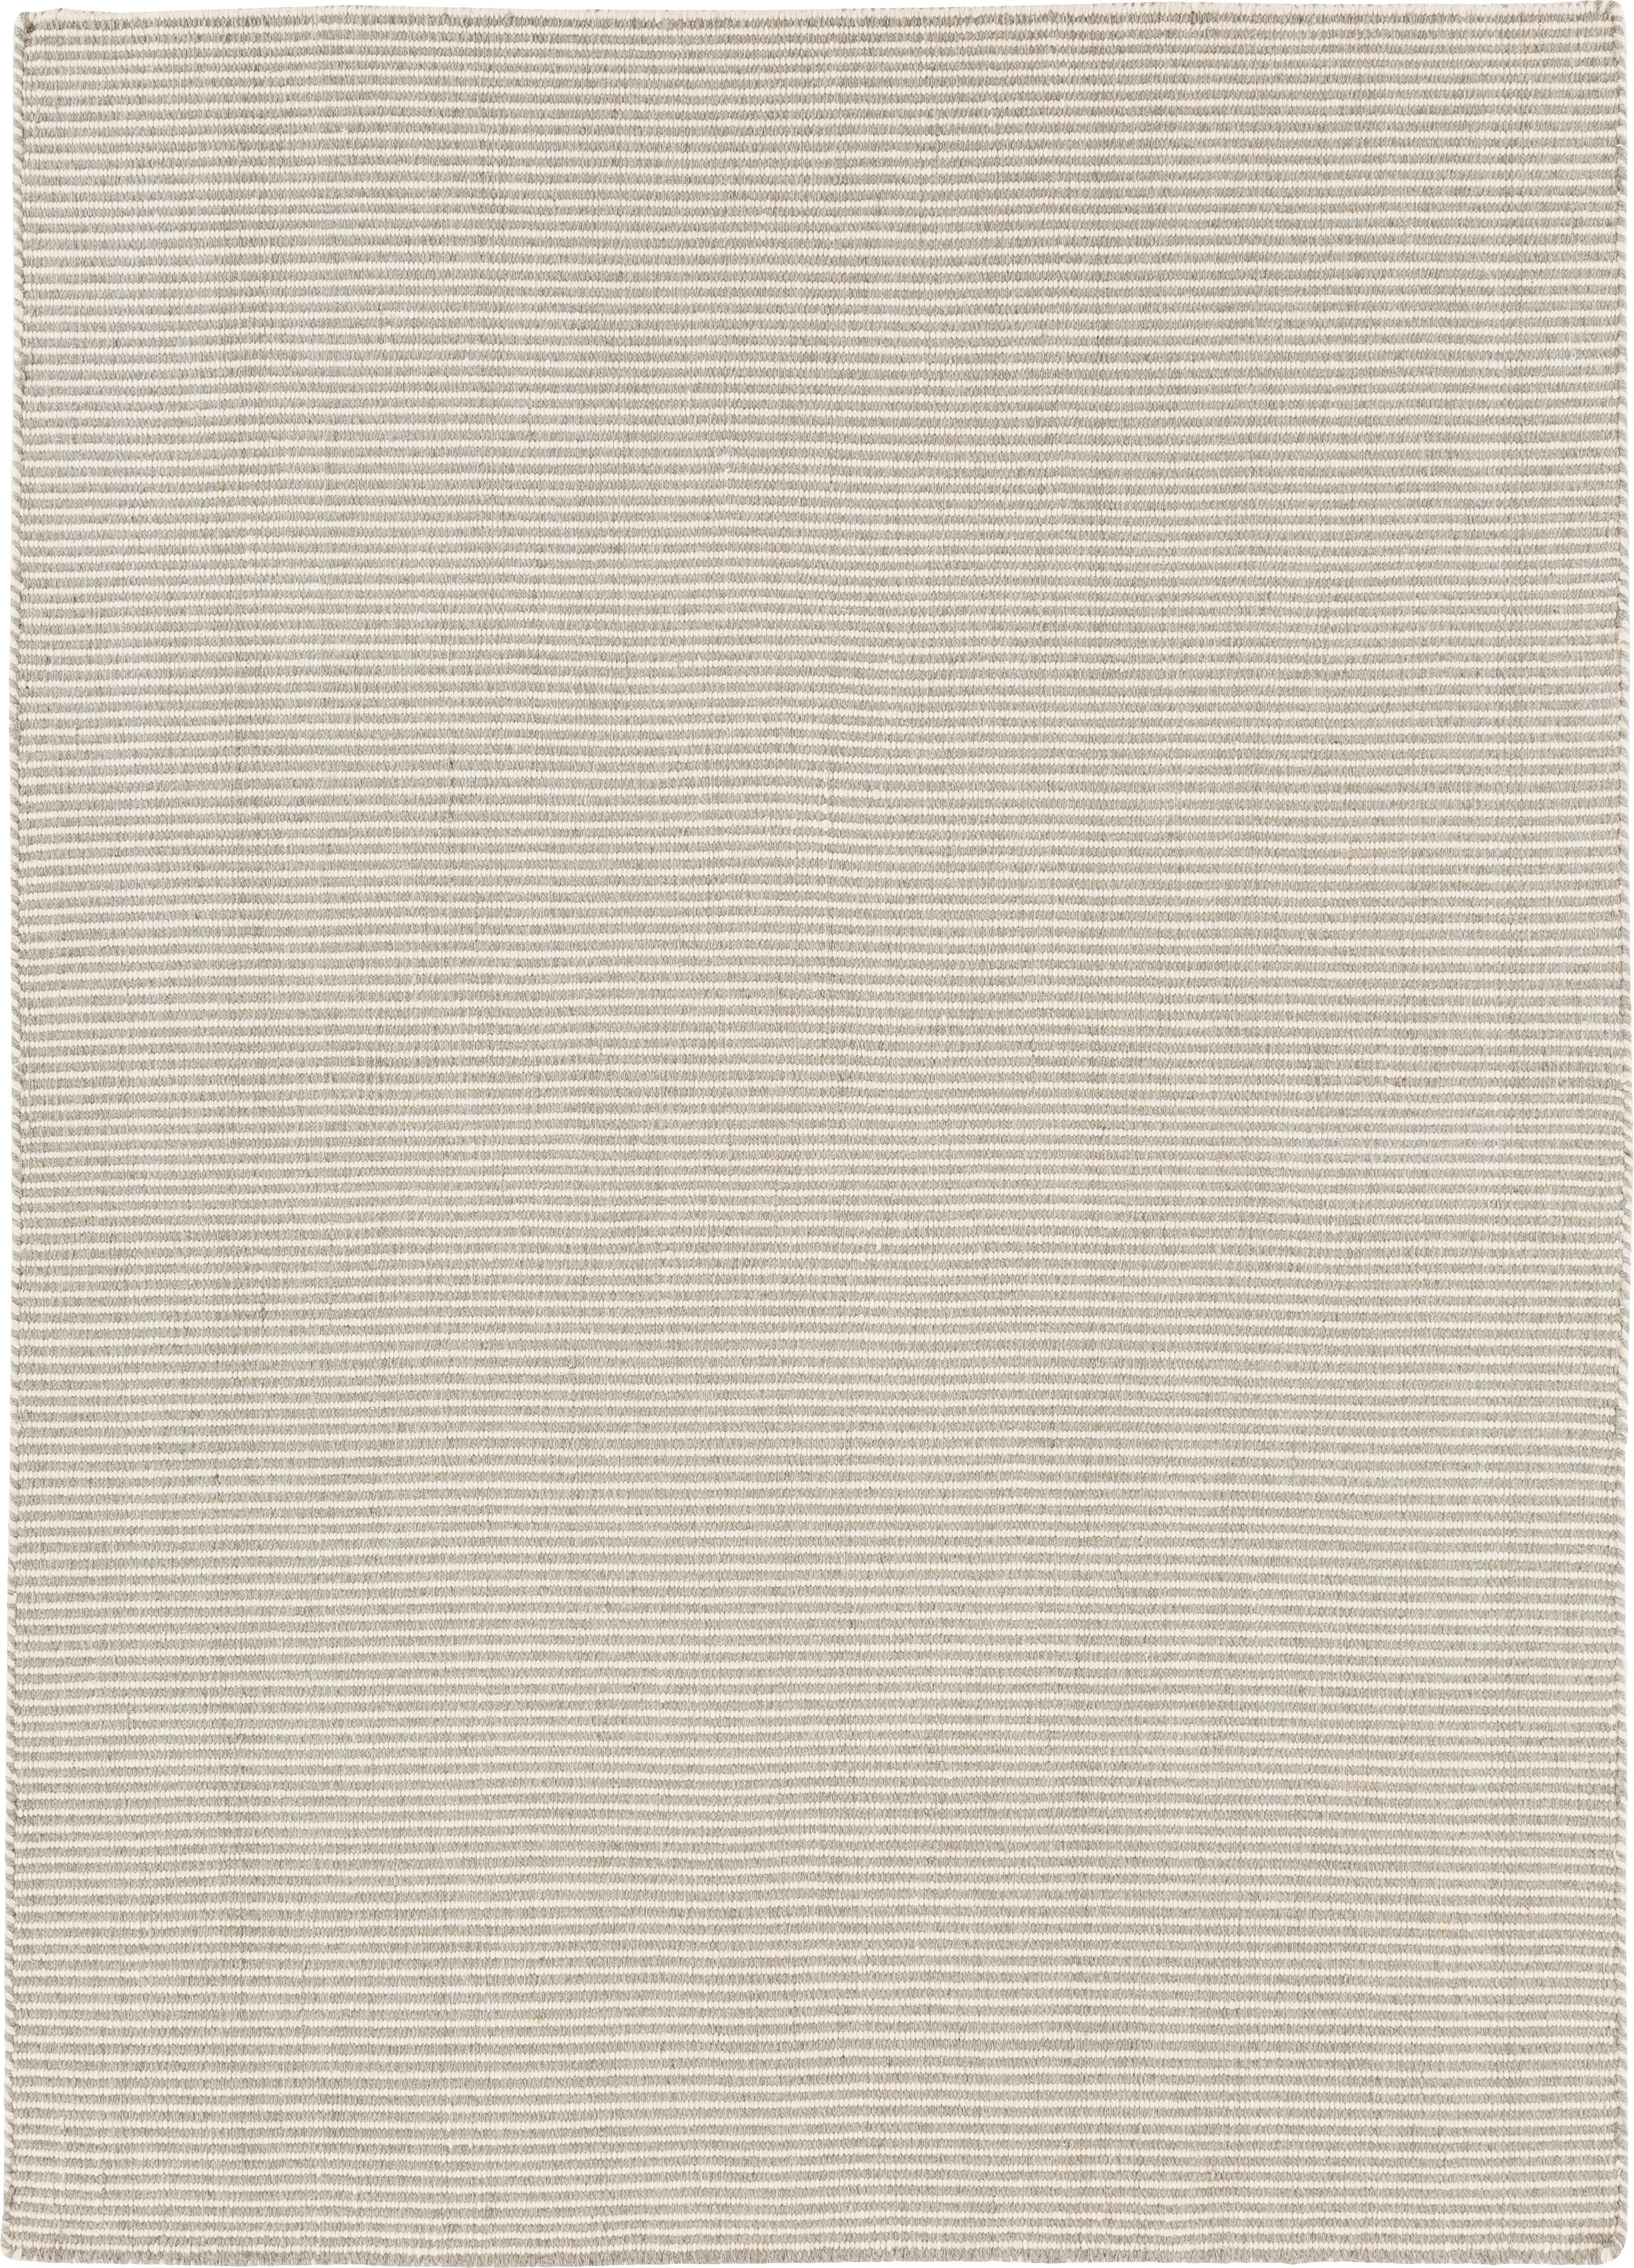 Fein gestreifter Wollteppich Ajo in Grau-Creme, handgewebt, Hellgrau, Creme, B 160 x L 230 cm (Größe M)